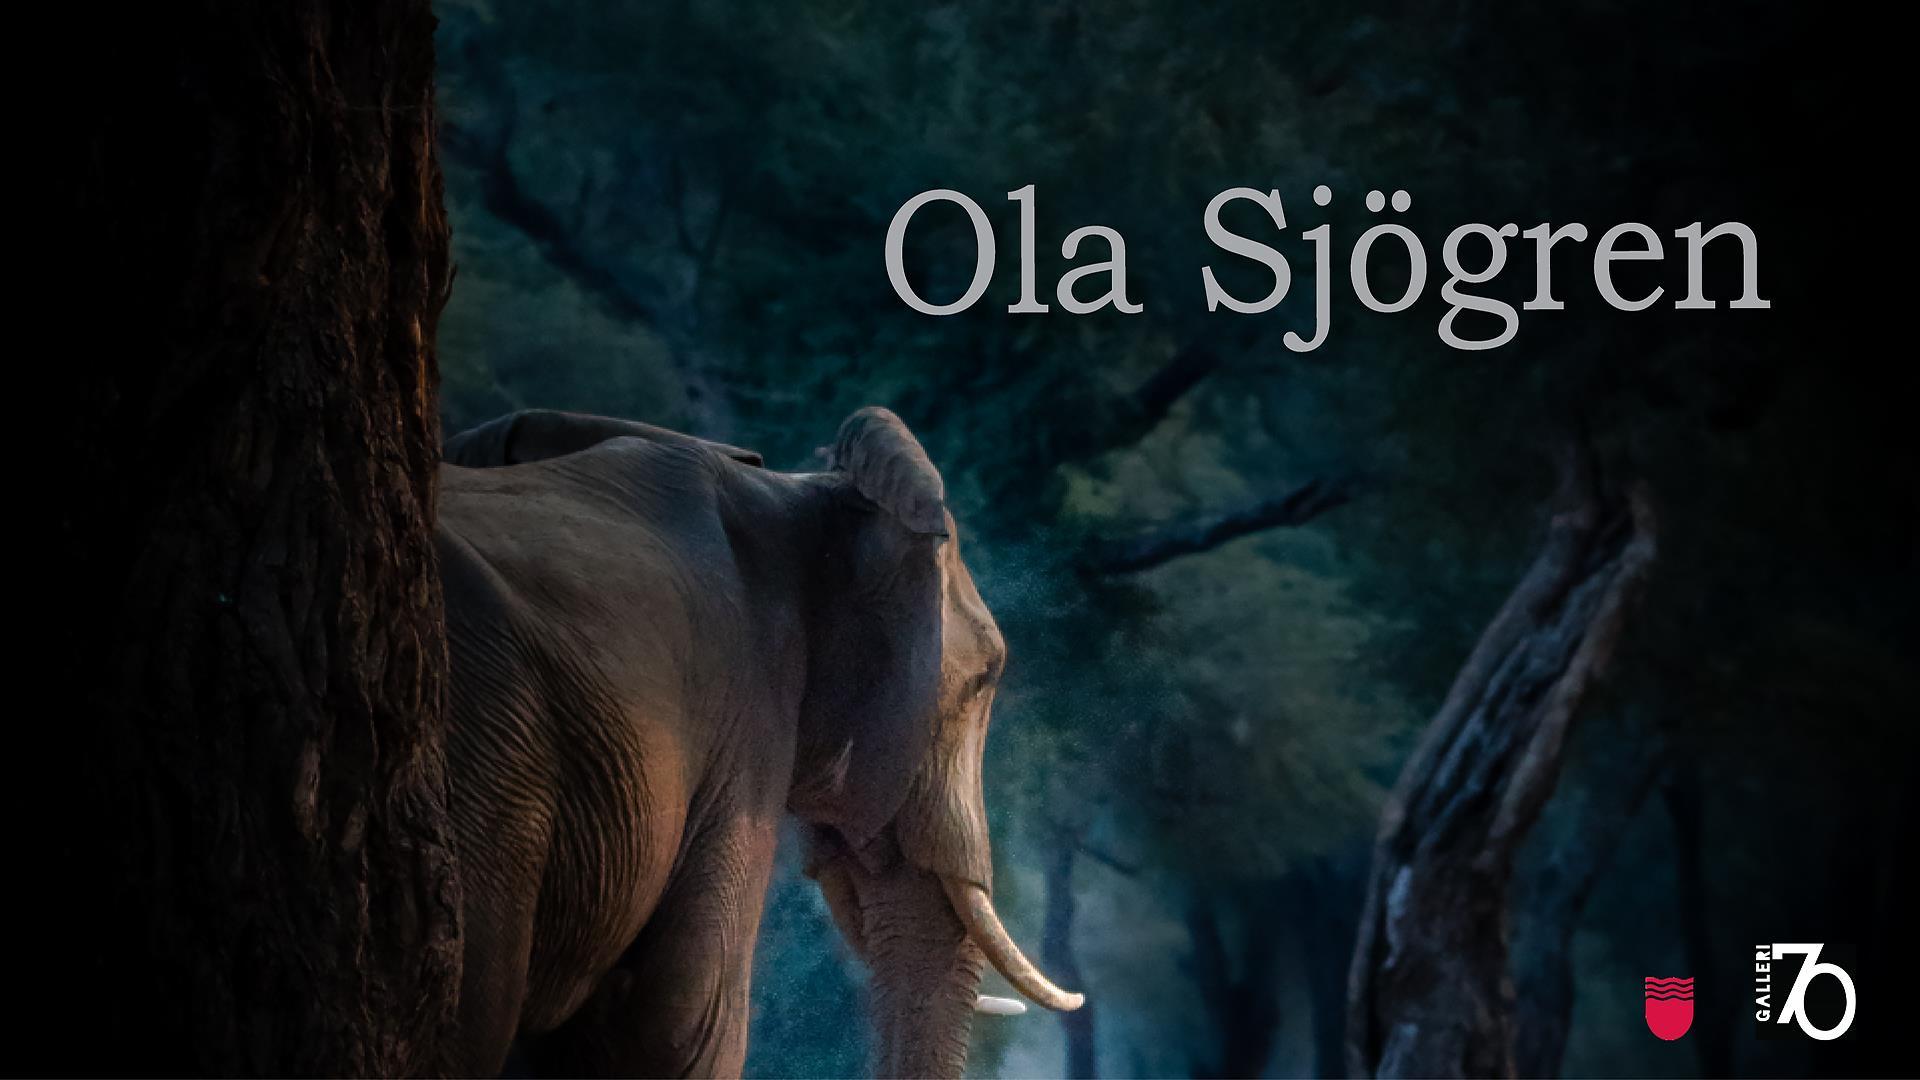 Ola Sjögren på Galleri70